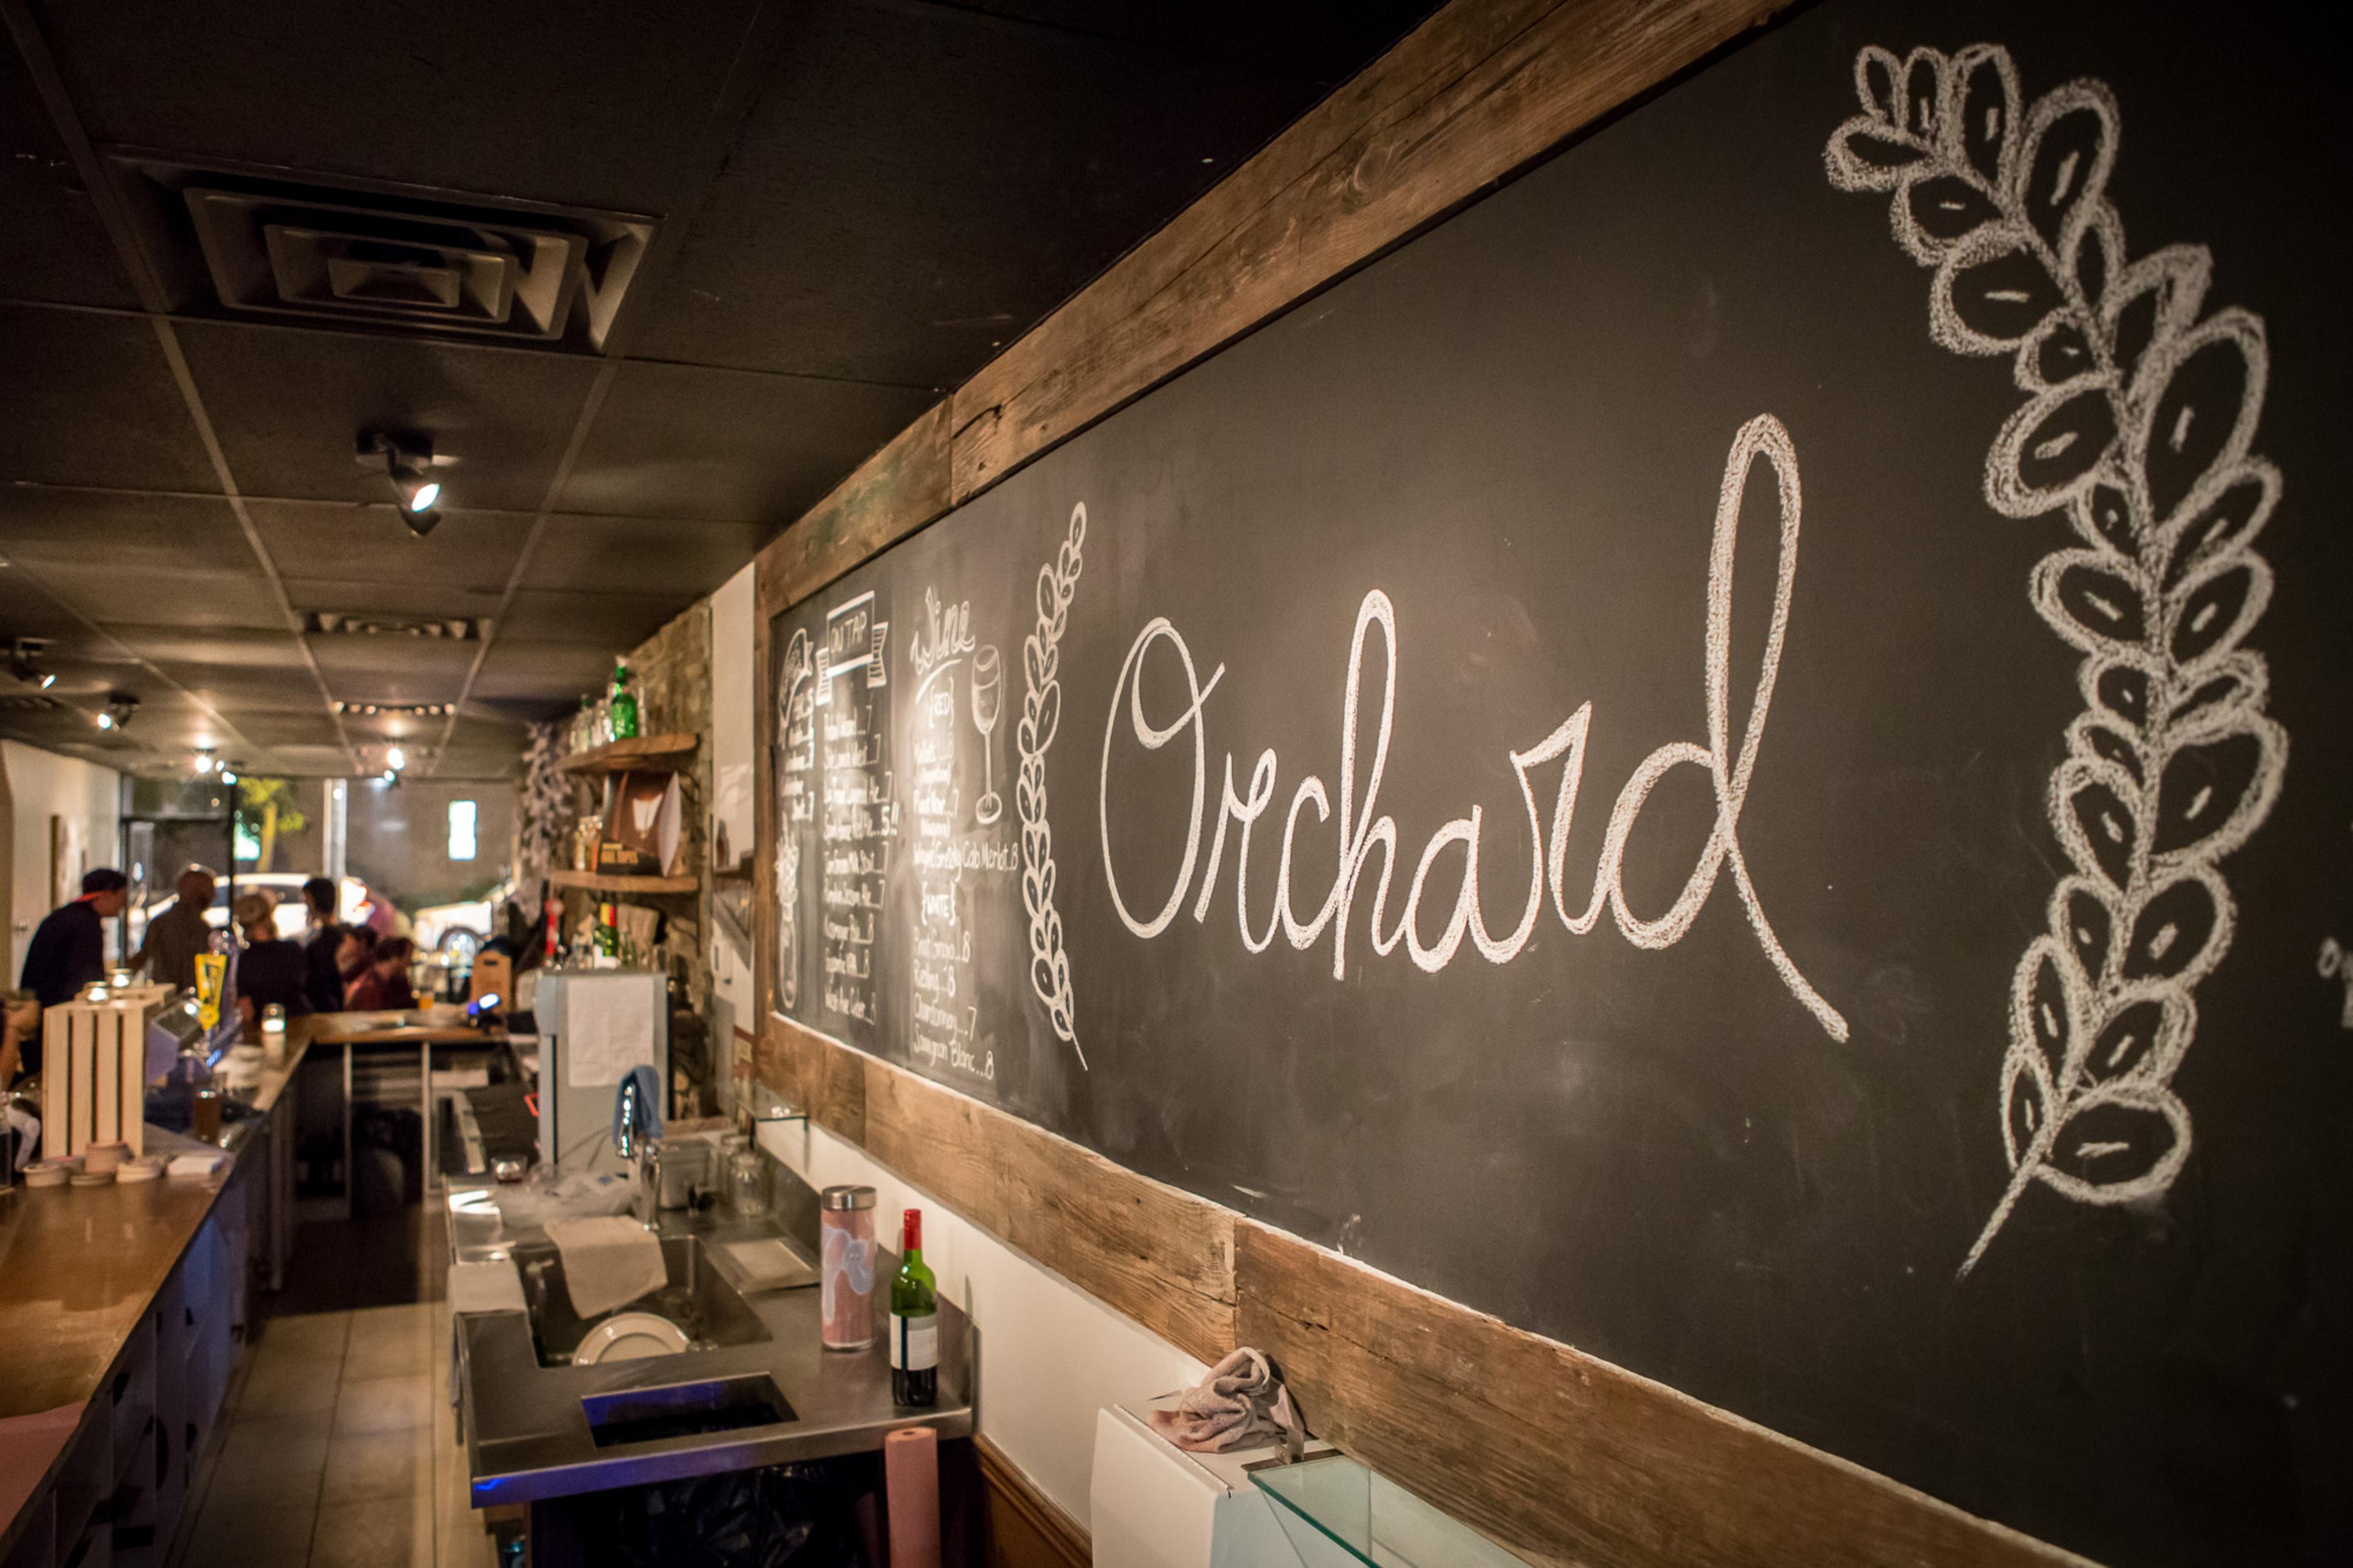 Orchard Toronto